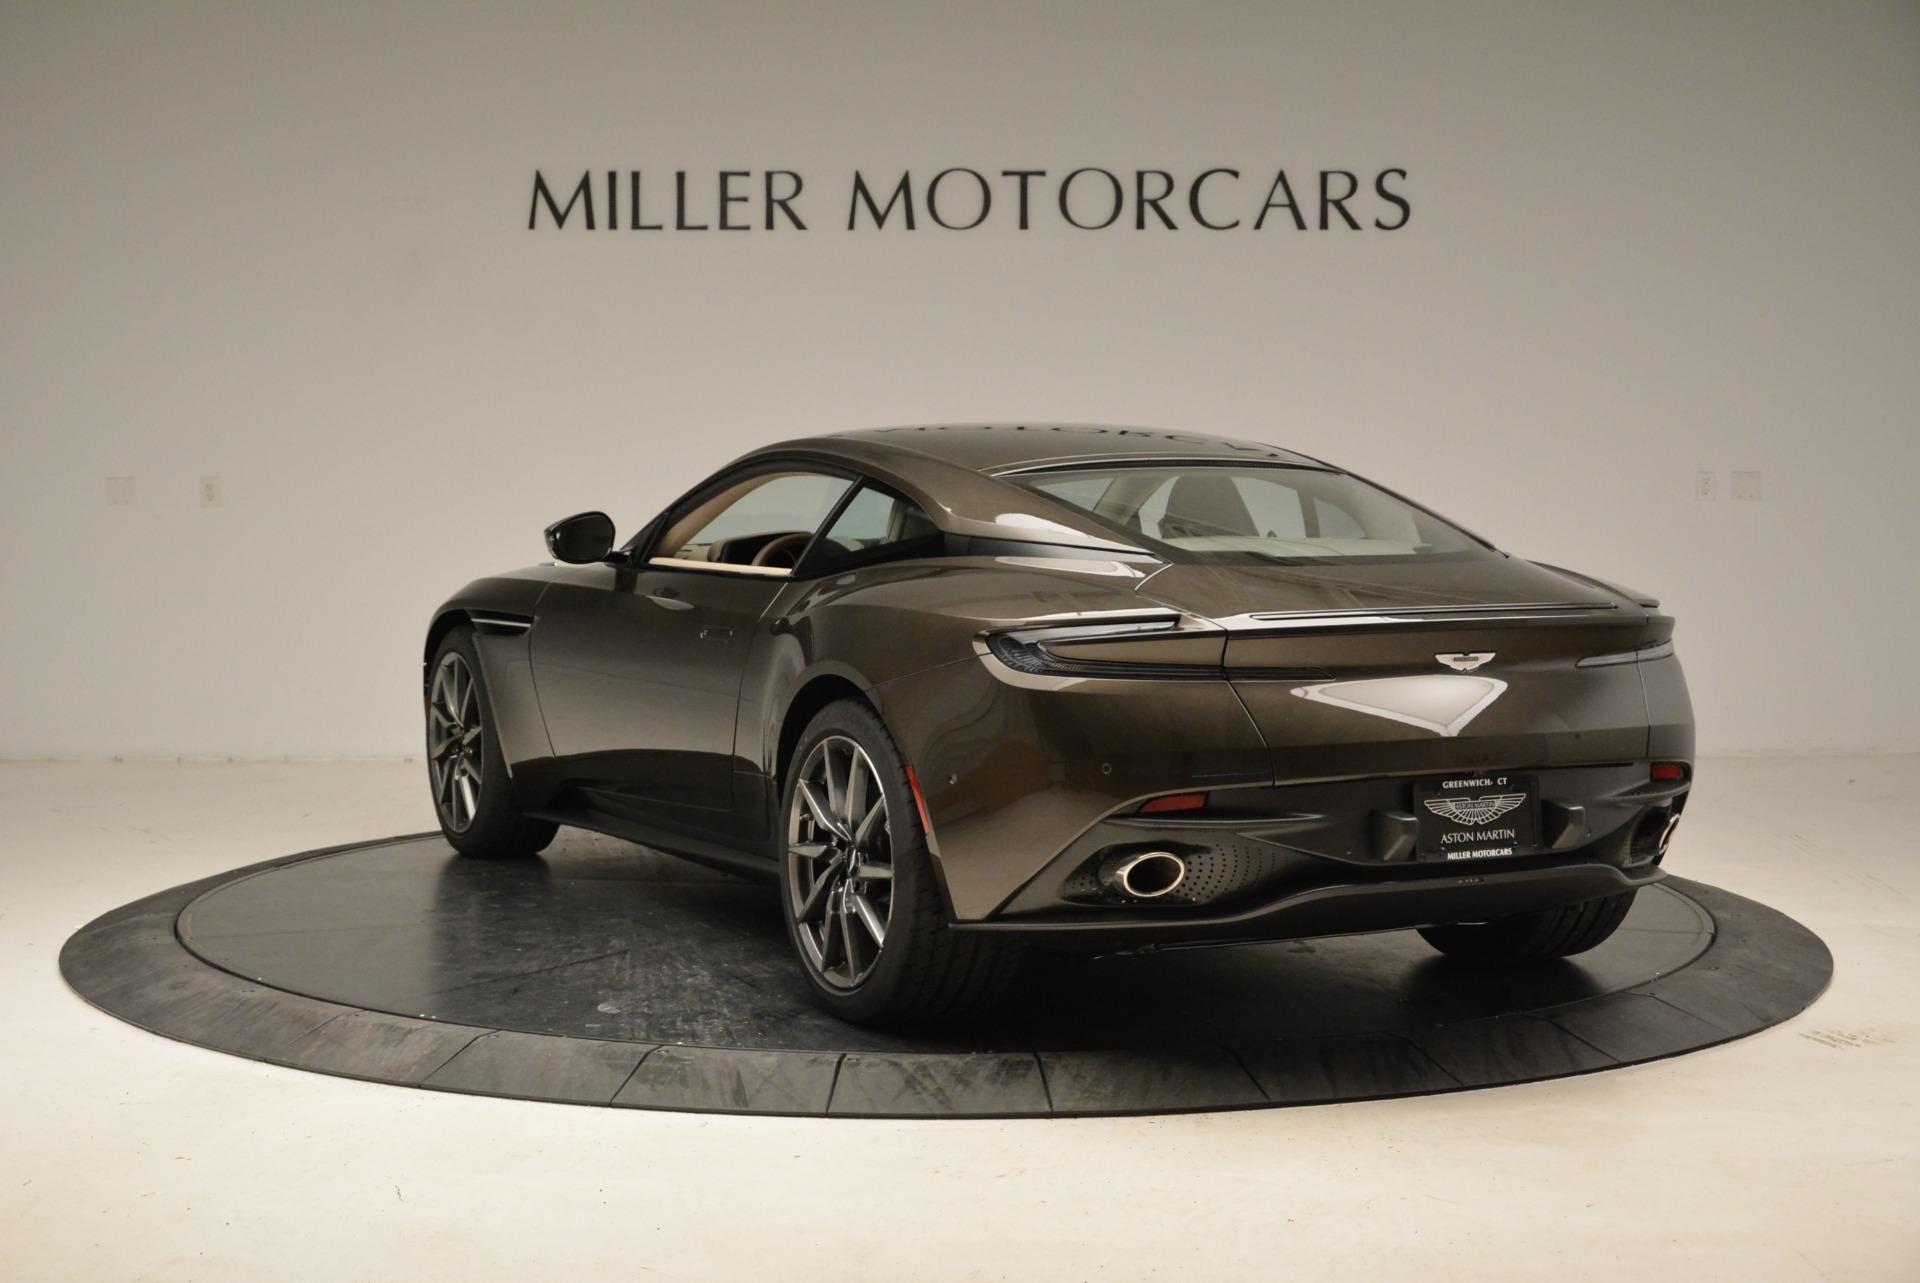 New 2018 Aston Martin DB11 V12 For Sale In Greenwich, CT 1904_p5